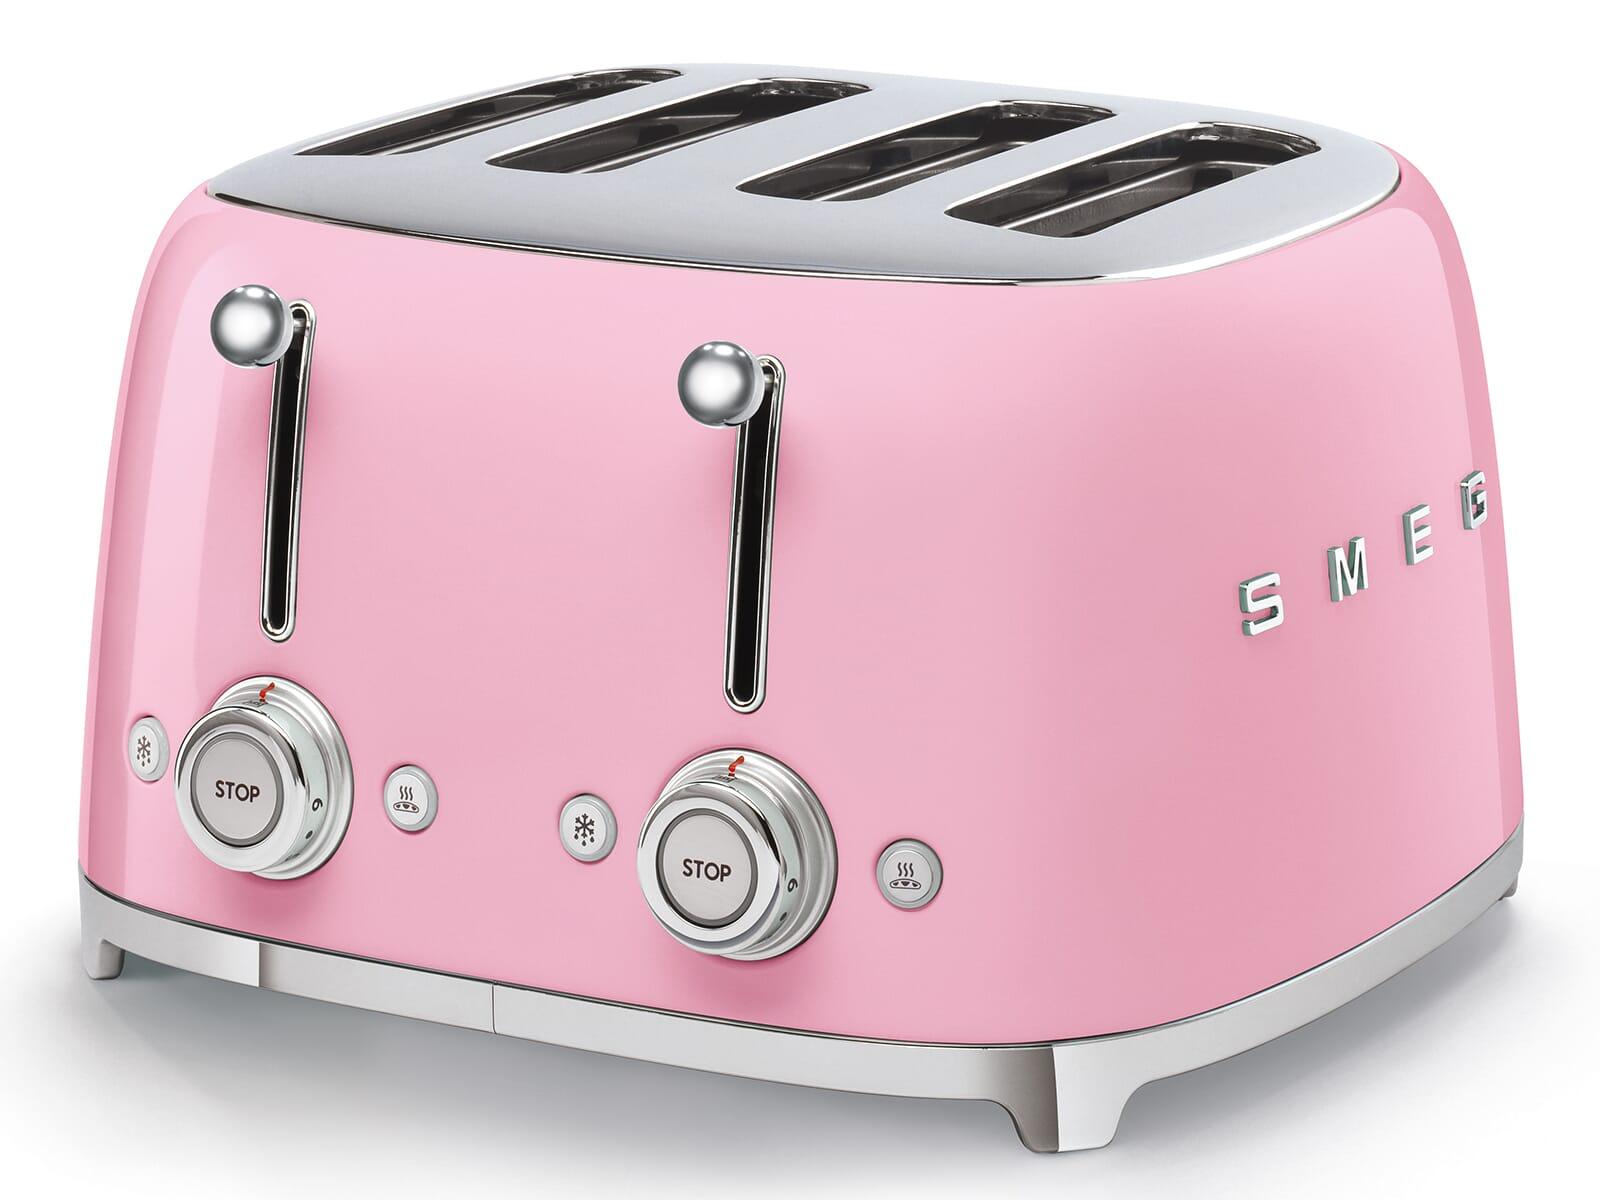 Smeg Kühlschrank Rosa : Kaffeemaschine rosa rosa kaffeemaschinen online kaufen möbel